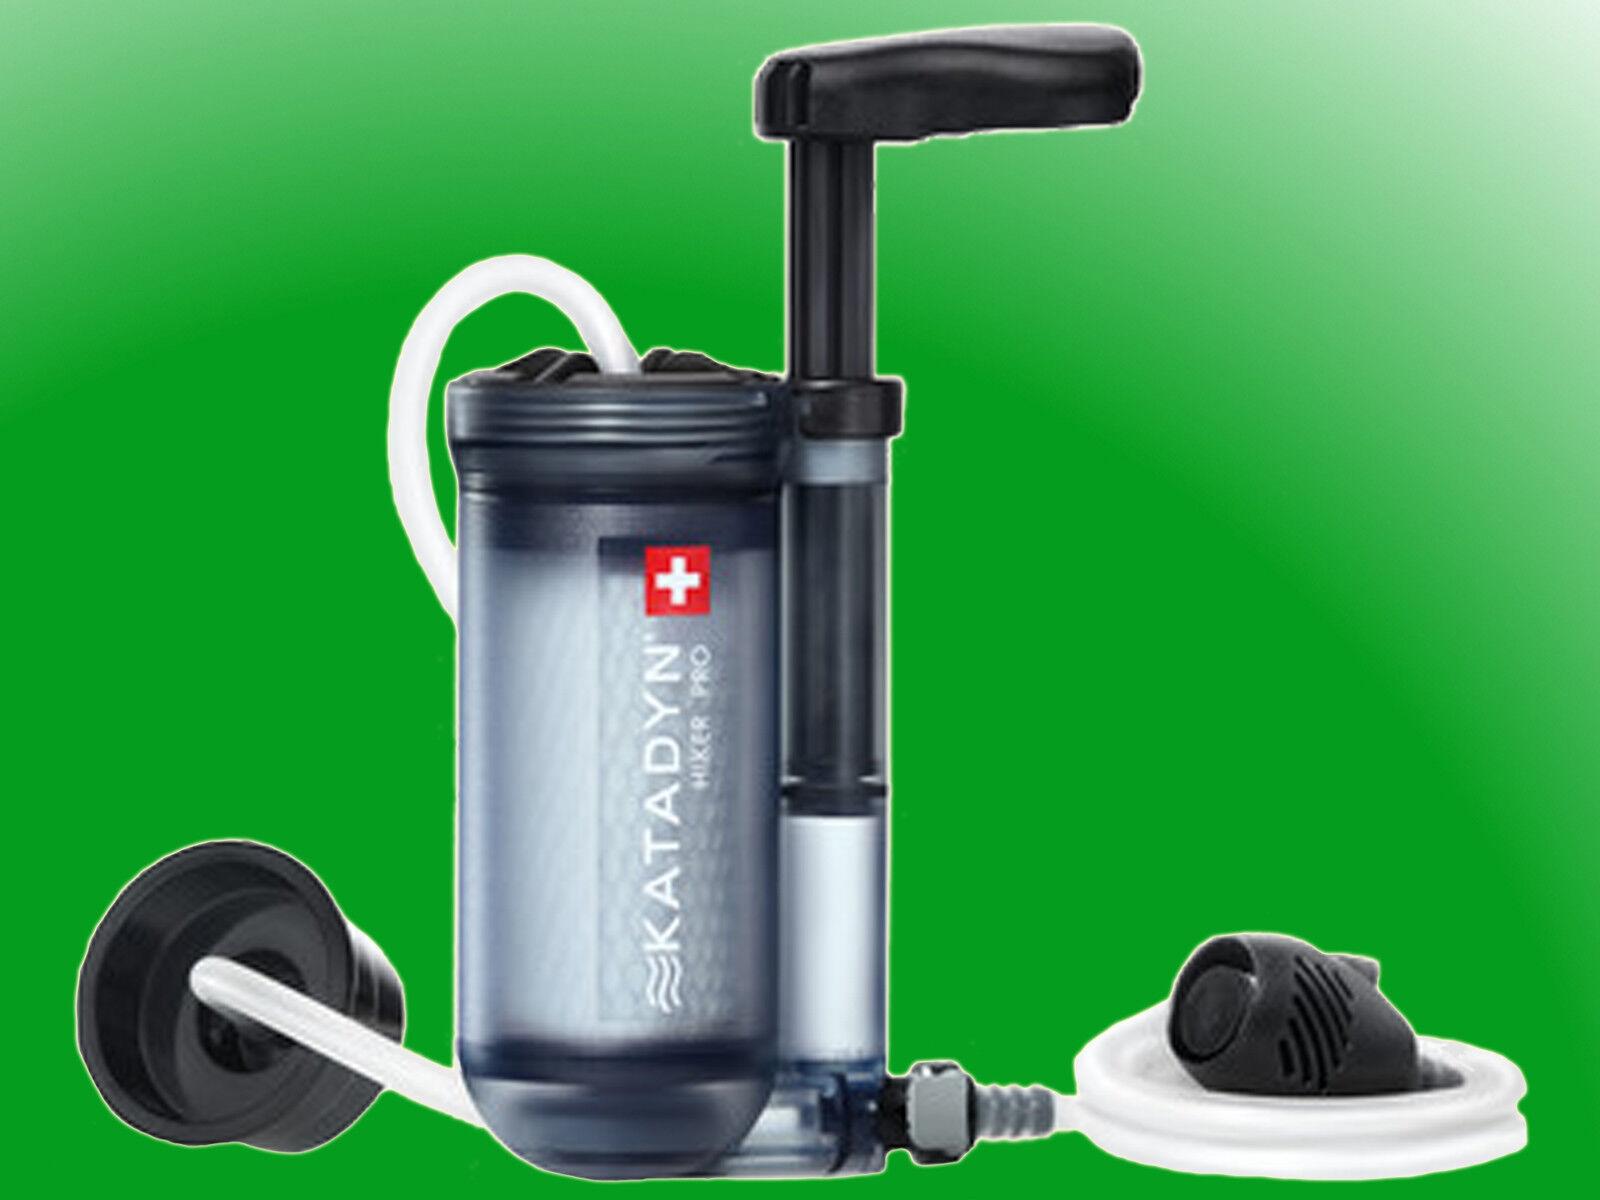 Katadyn Hiker pro filtro  de agua transparente, Agua purifier, agua potable-Filter  online barato